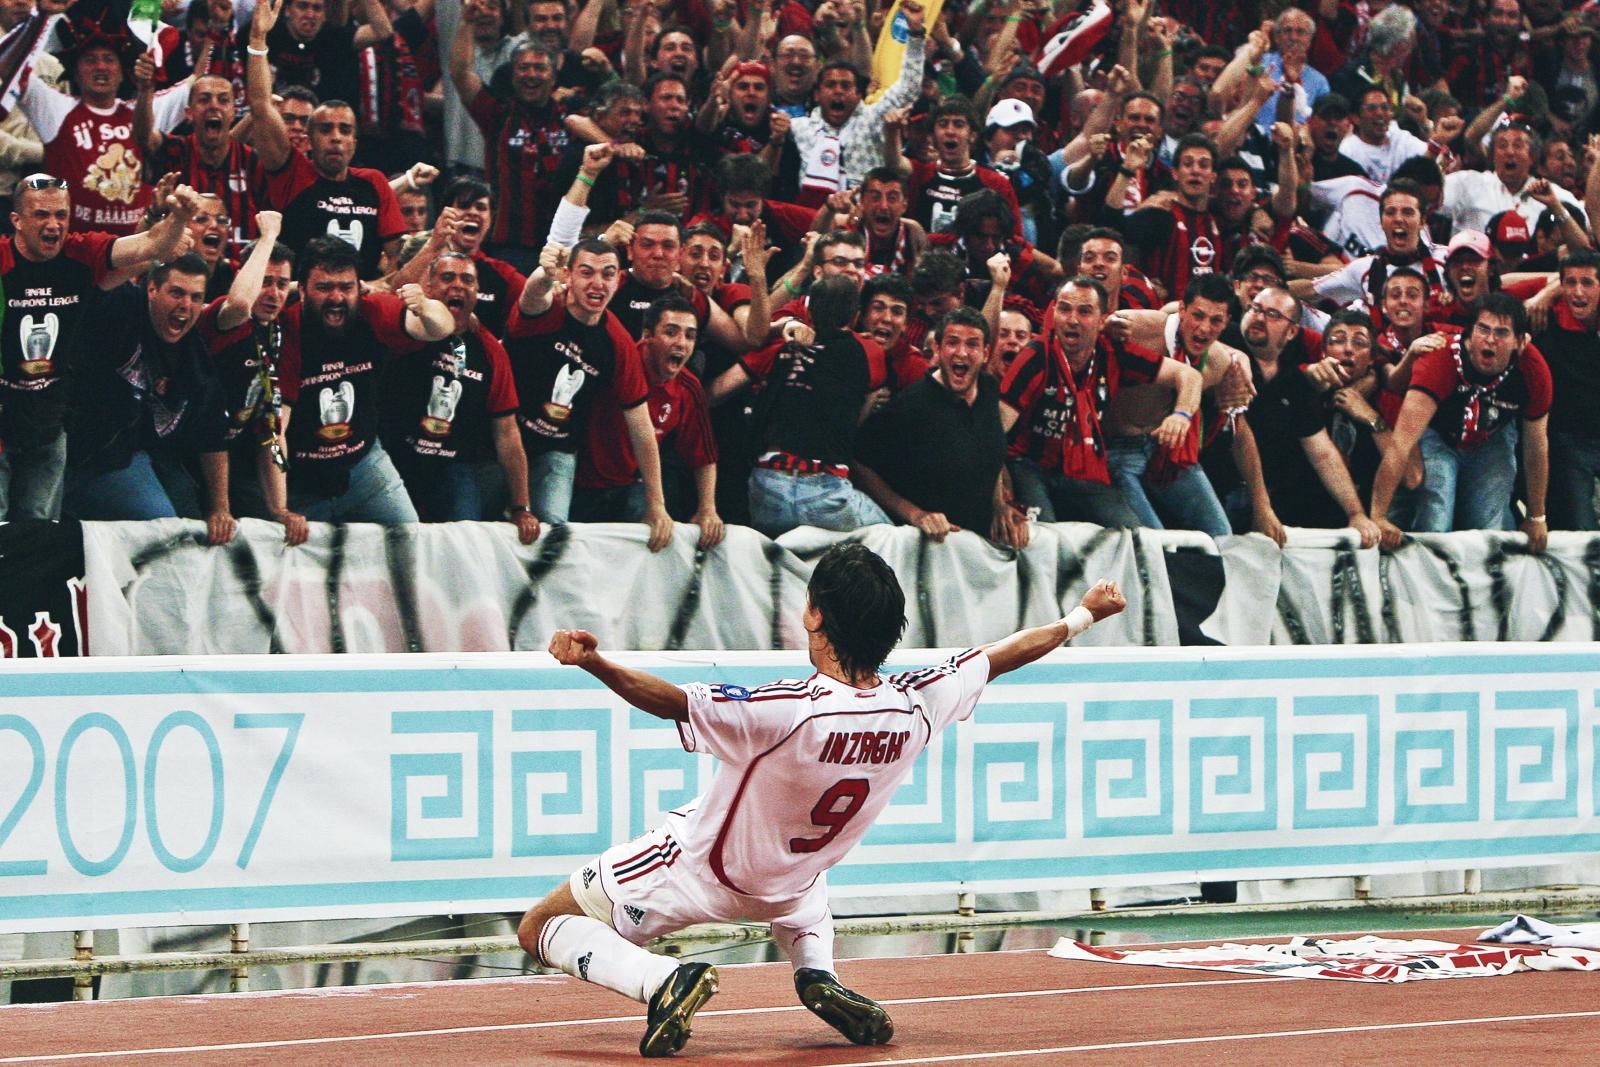 Rossoneri s revenge  AC Milan s memorable road to Athens in 2007 3e80f045336bc